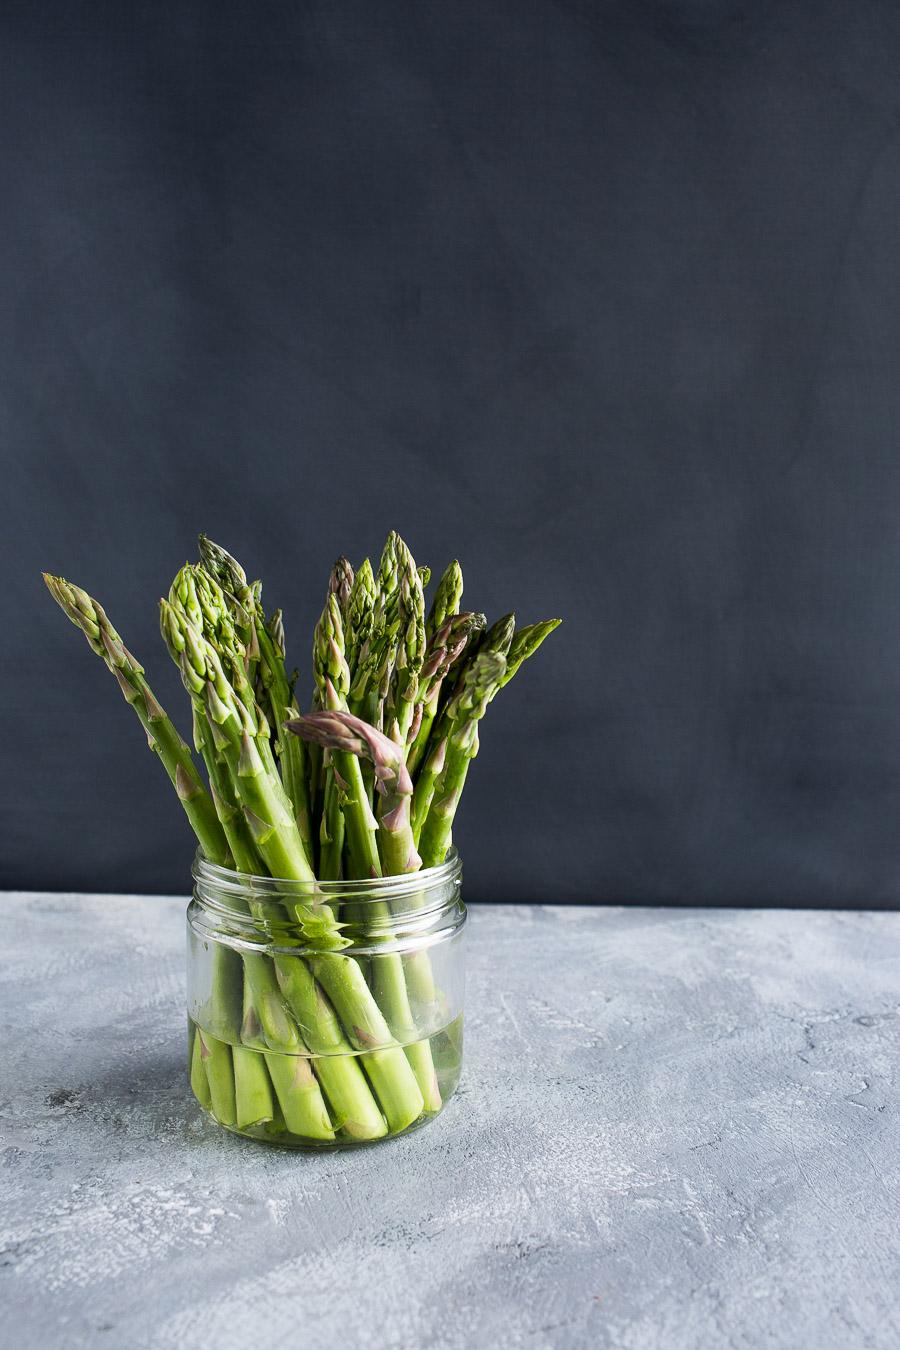 Springtime Asparagus Salad